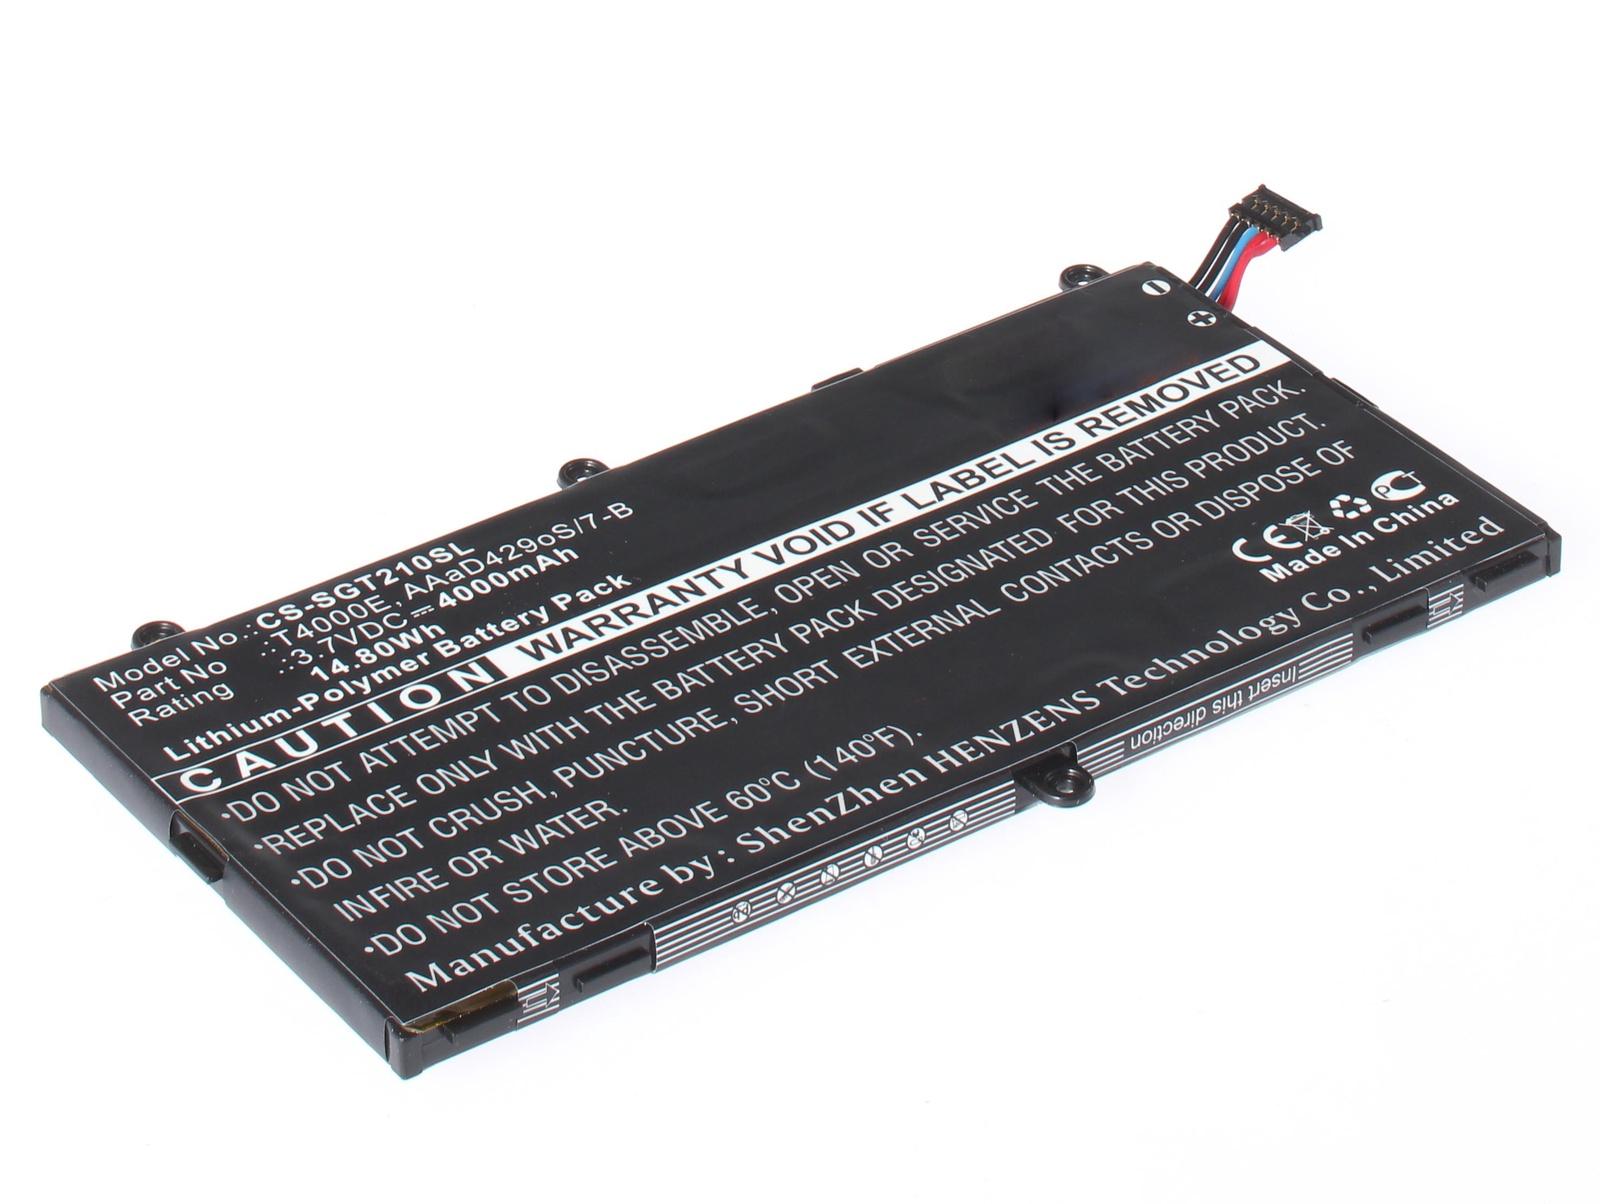 Аккумуляторная батарея iBatt iB-T1-A1287 4000mAh для ноутбуков Samsung Galaxy Tab 3 7.0 SM-T211, Galaxy Tab 3 7.0 SM-T210, Galaxy Tab 3 7.0 SM-T211 8Gb, Galaxy Tab 3 7.0 SM-T210 8Gb, Galaxy Tab 3 7.0 SM-T2105, Galaxy Tab 3 7.0 SM-T2105 8Gb, samsung galaxy tab a 7 0 sm t280 wi fi 8gb 7 1280x800 1536mb wifi google android 5 1